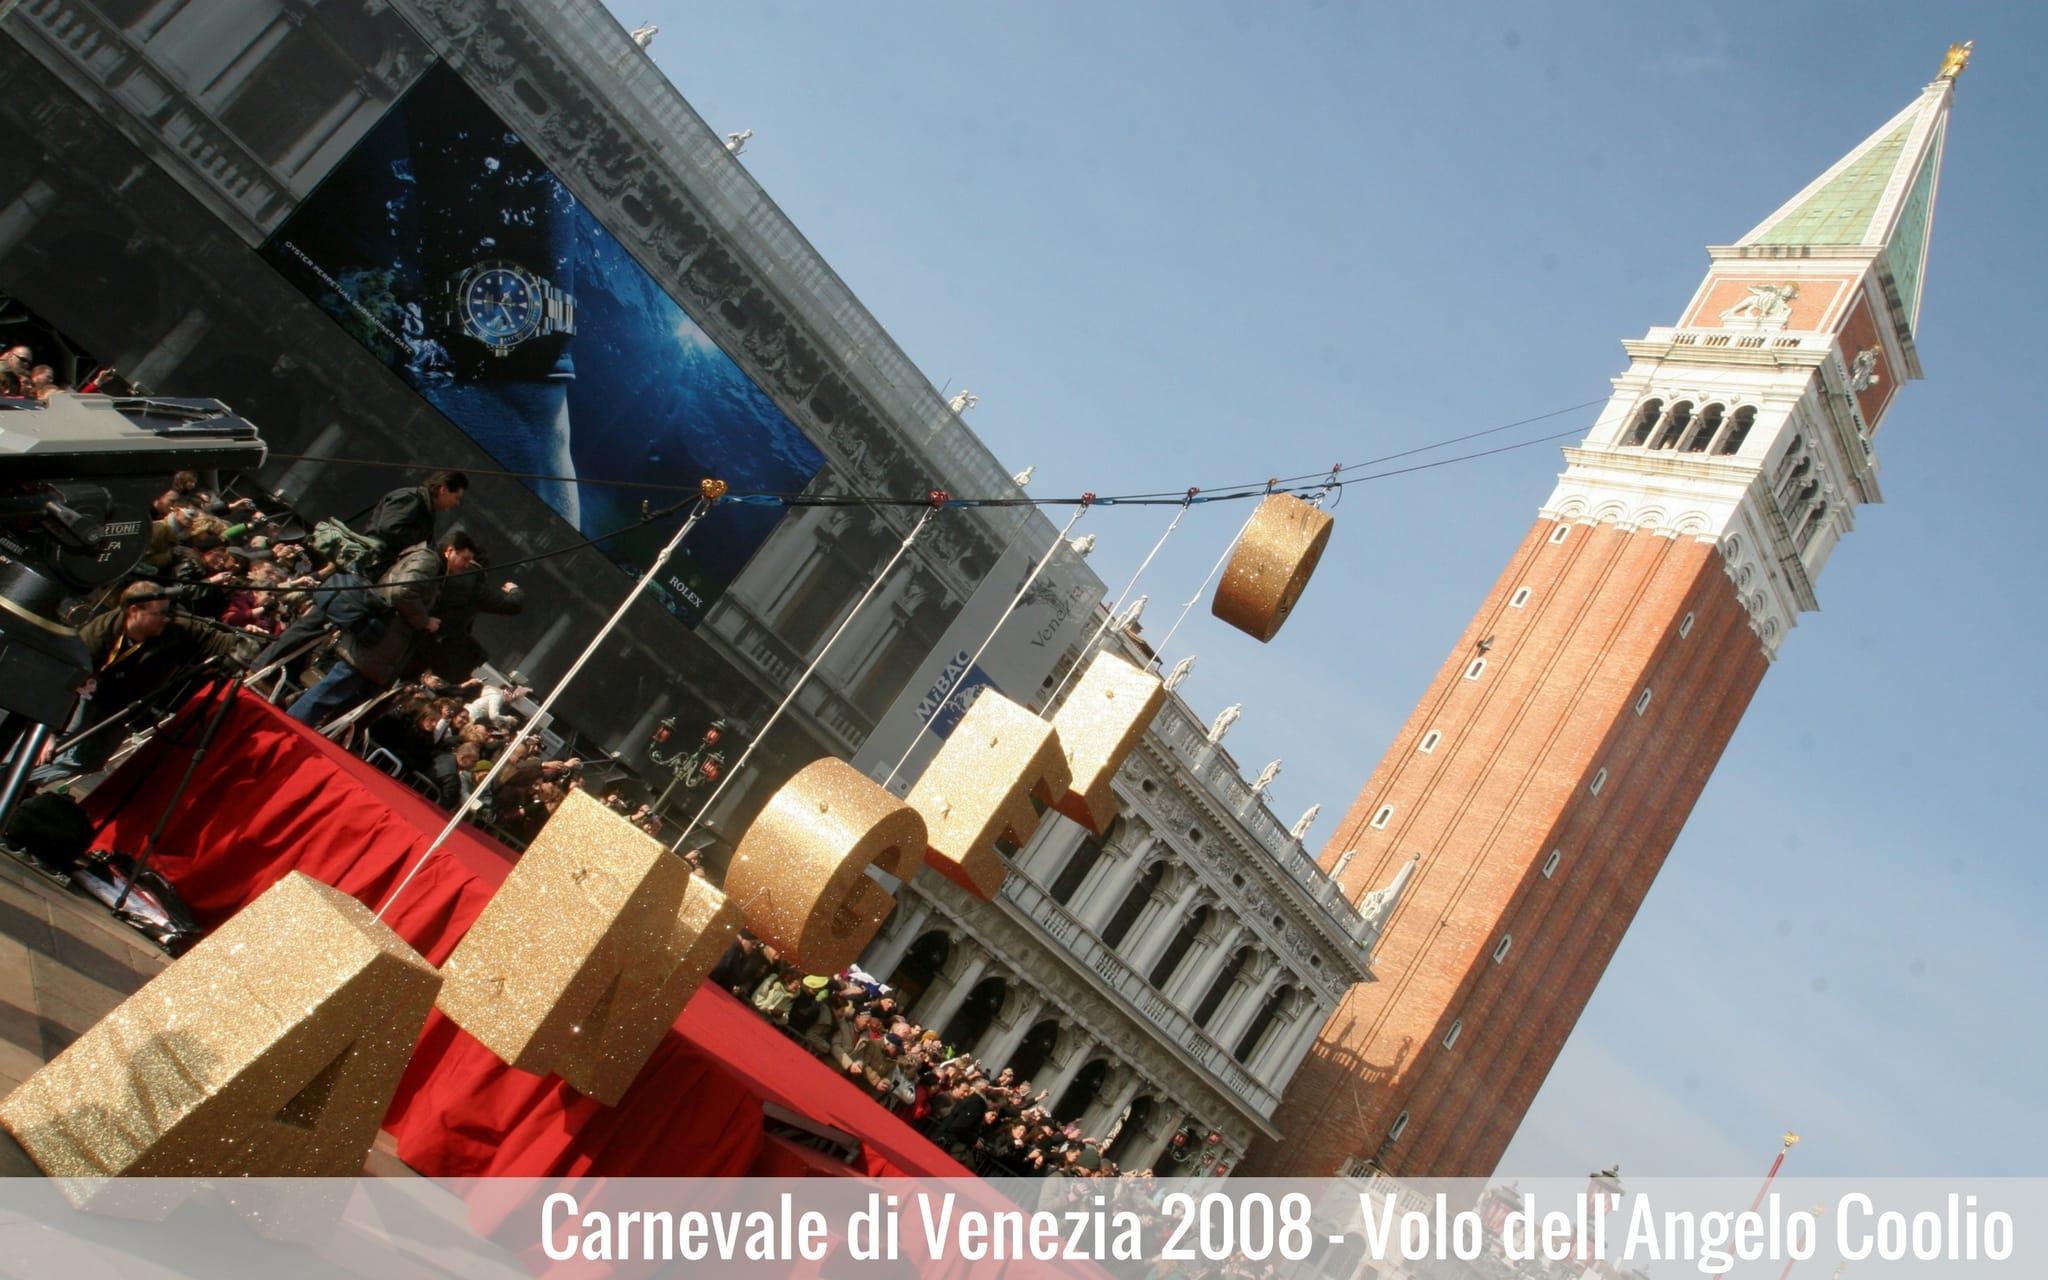 2008 VOLOANGELO venezia